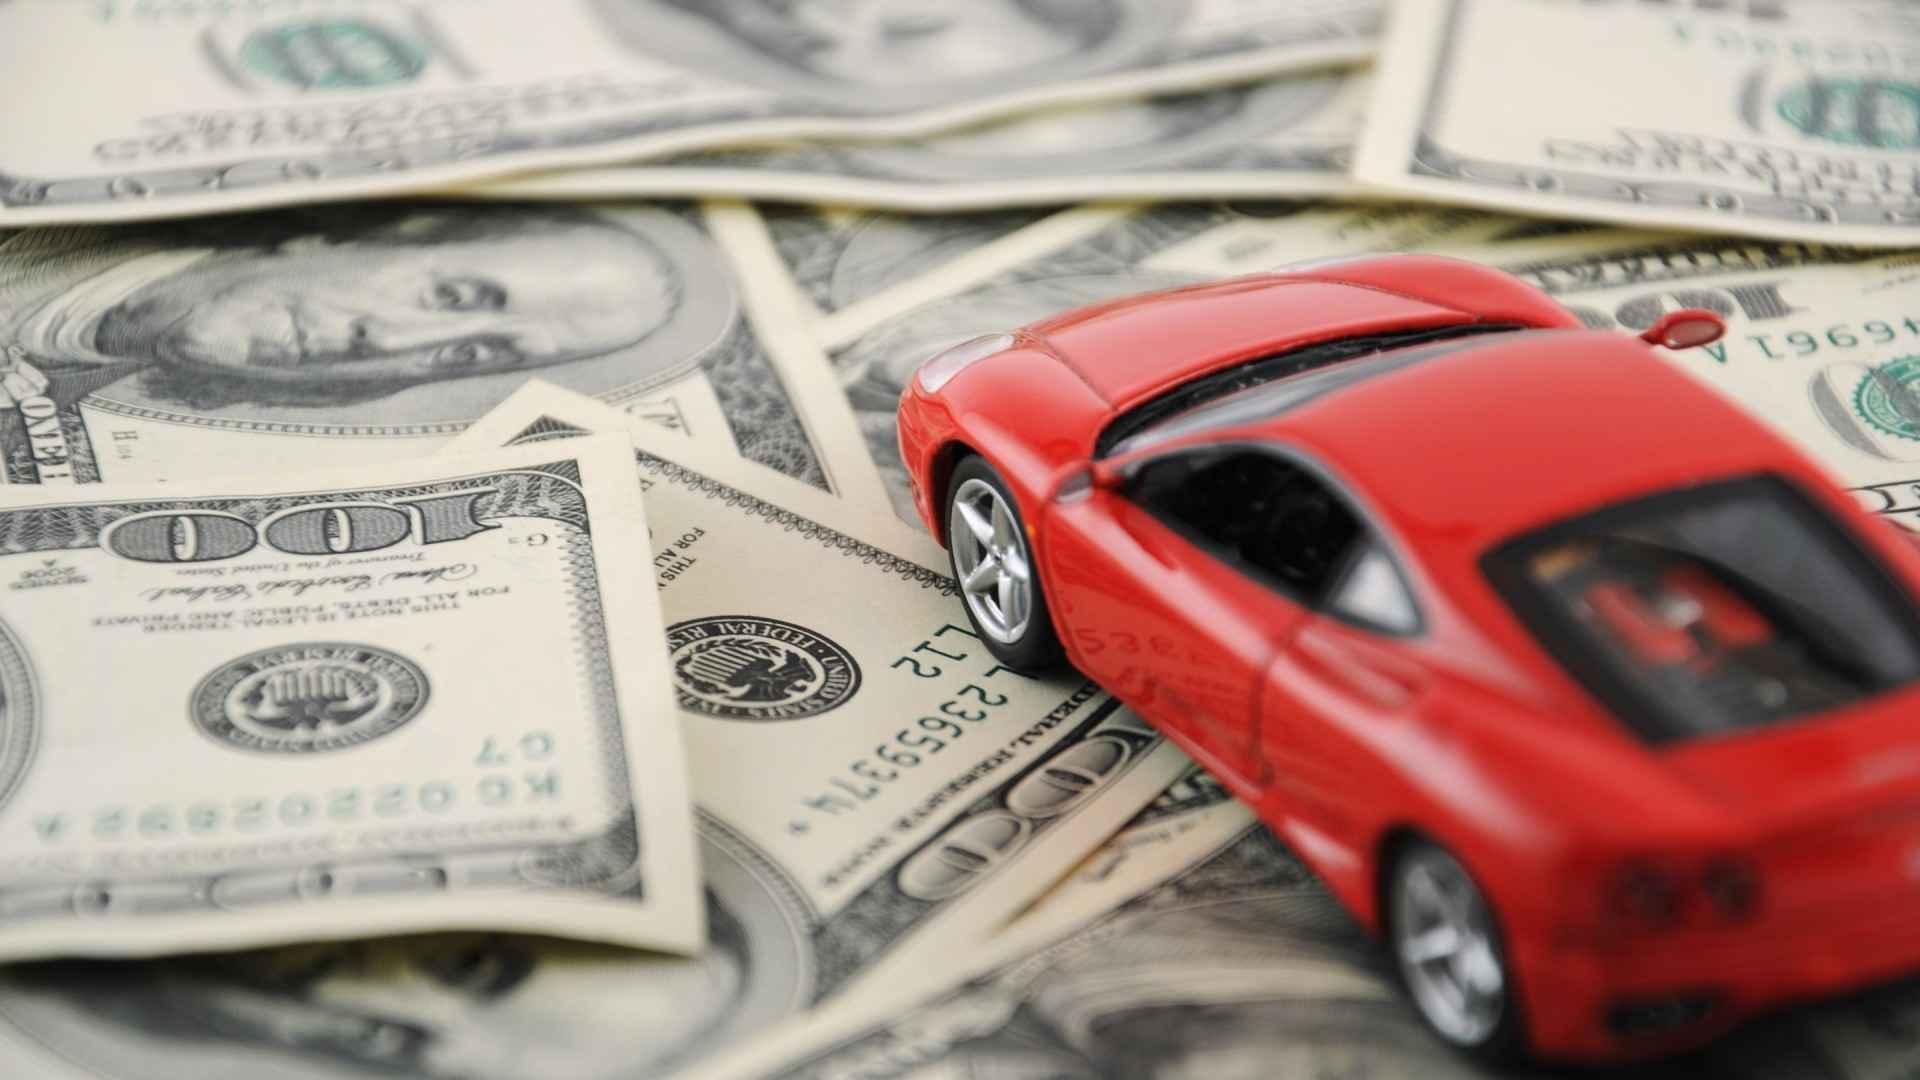 Кредит в Дербенте под залог ПТС грузового автомобиля. Займ под залог грузового транспорта